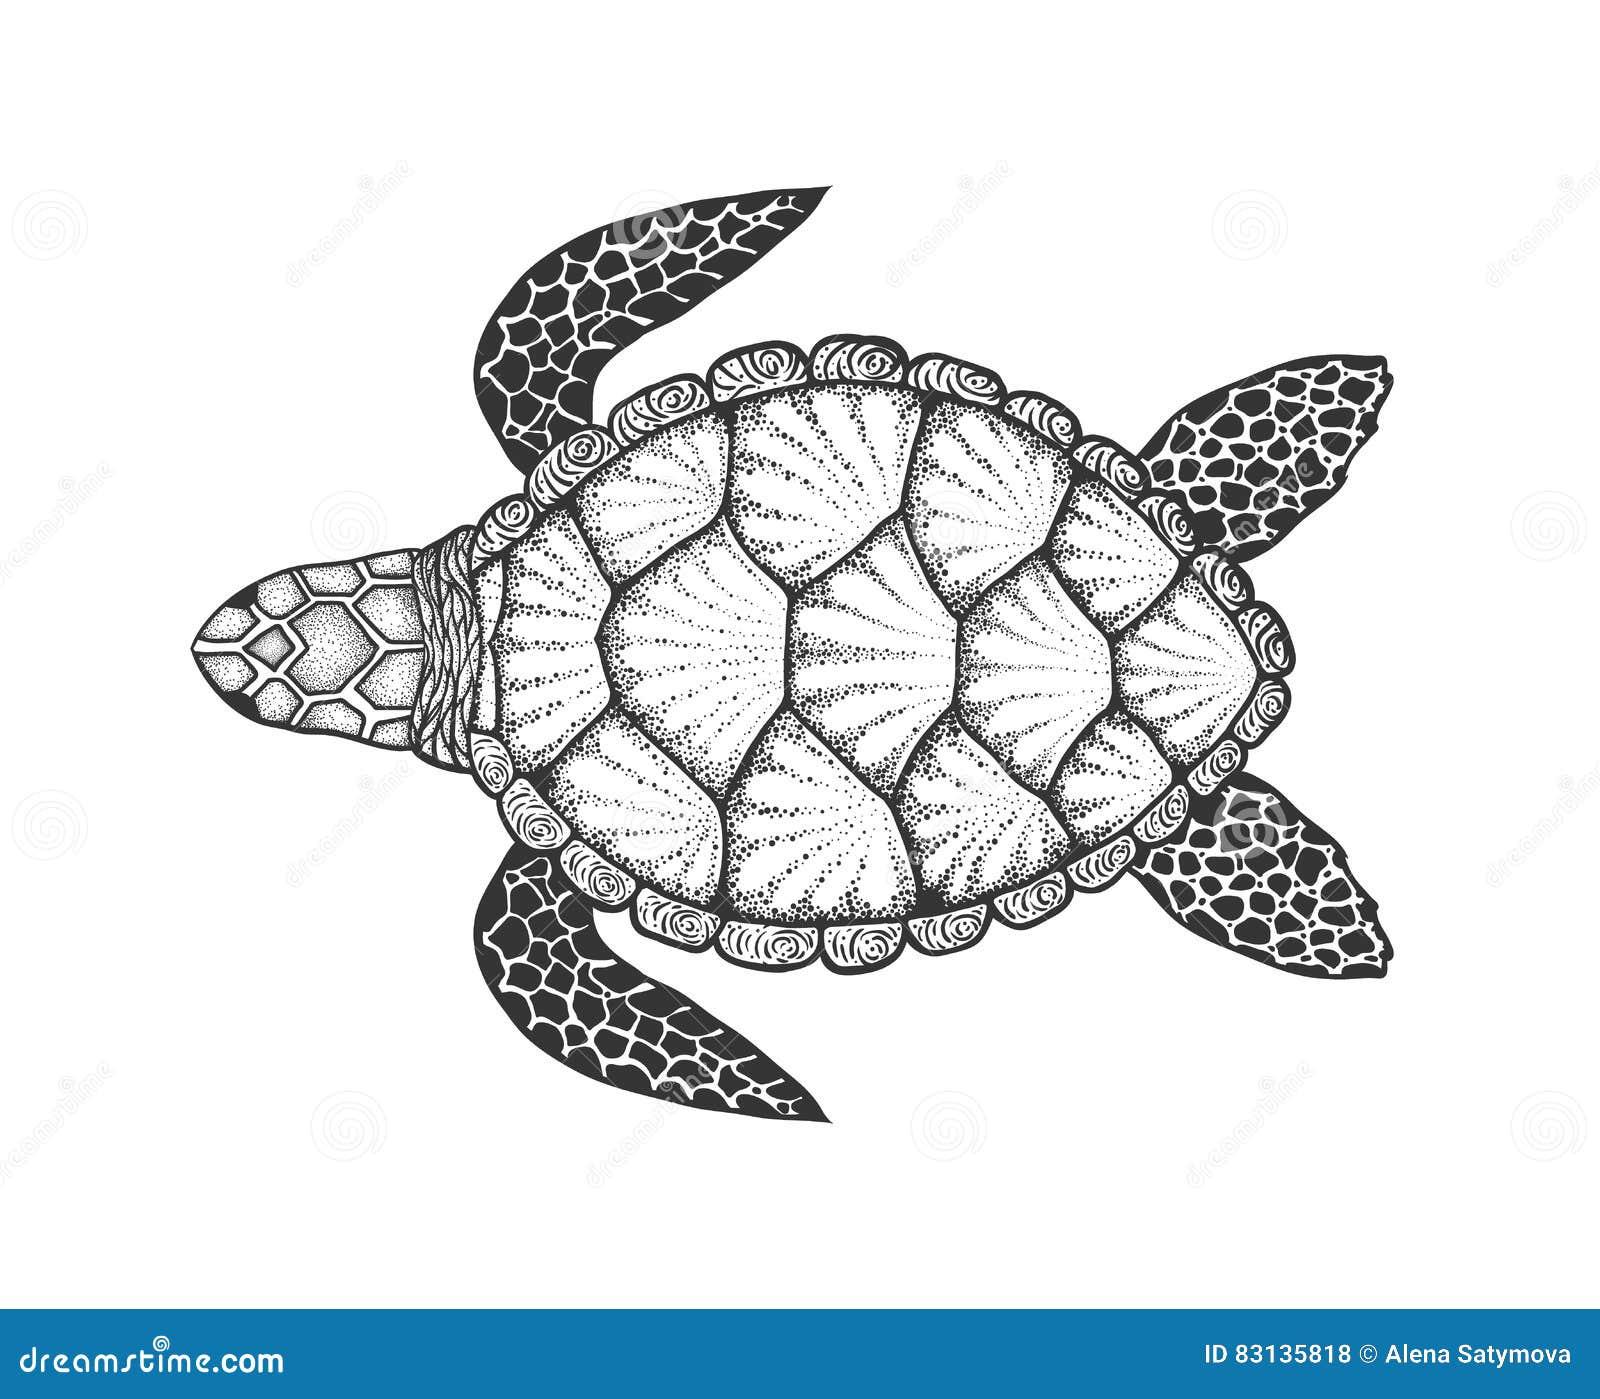 Tartaruga De Mar Na Linha Estilo Da Arte Ilustracao Desenhada Mao